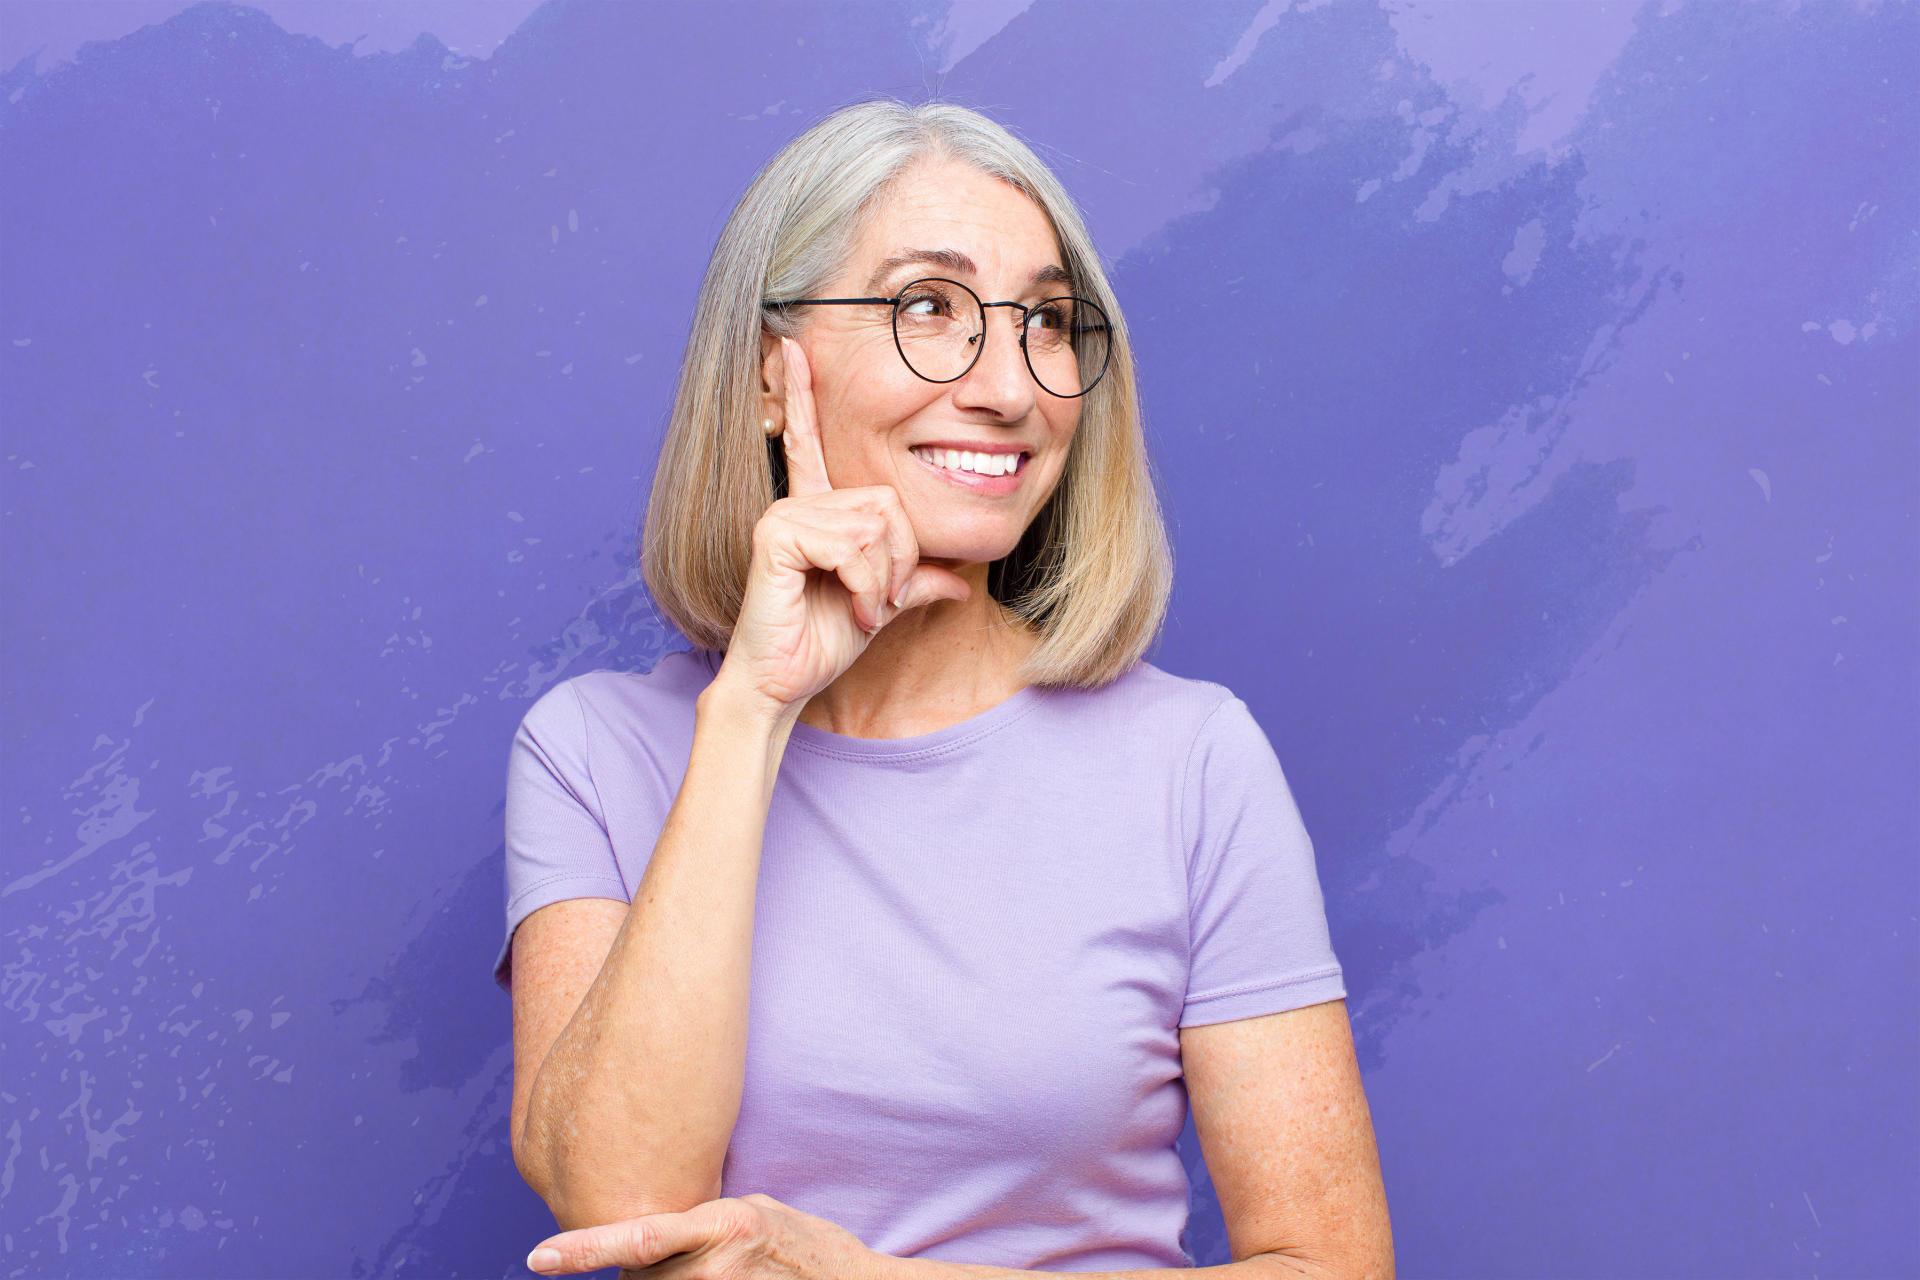 Senior citizen's oral care